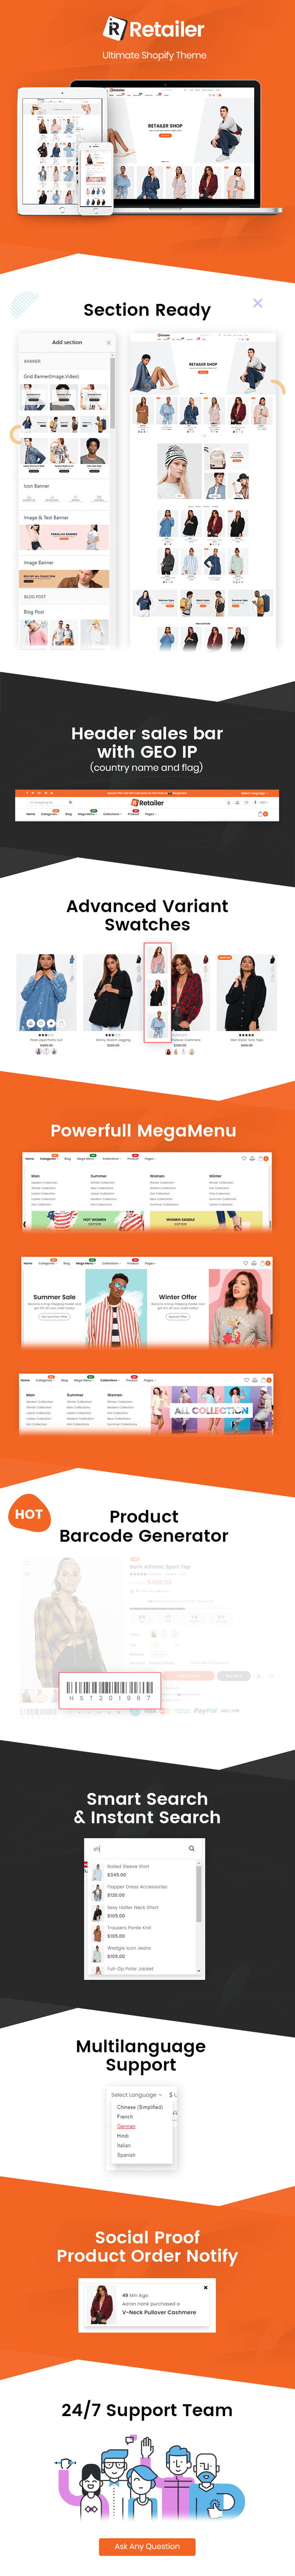 Retailer - Multipurpose Shopify Theme